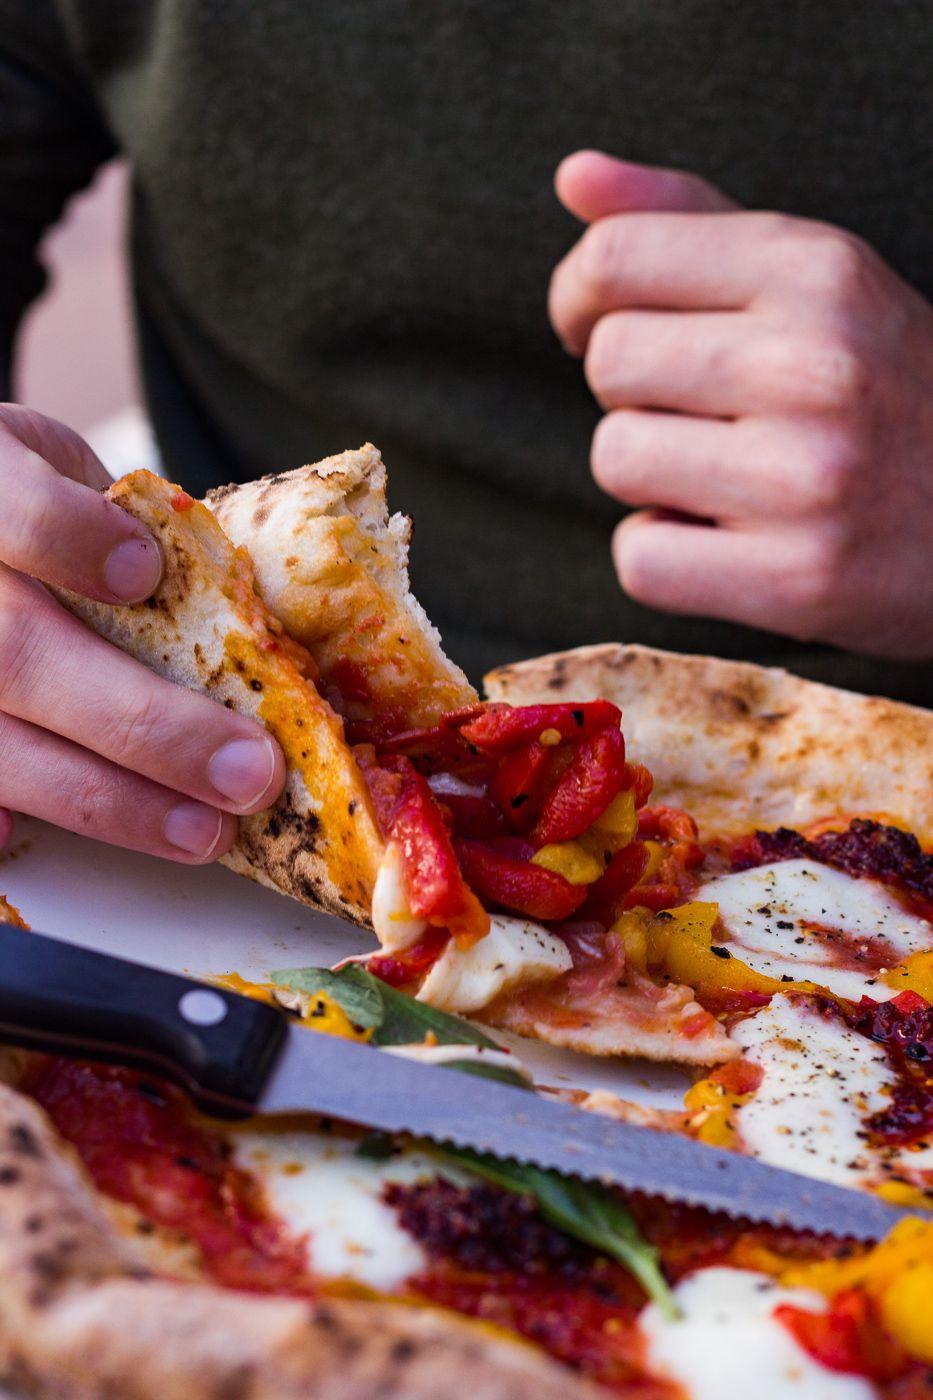 Pizza At Fatto A Mano North Laines Brighton Middle Of Adventure Food Brighton Restaurants Yum